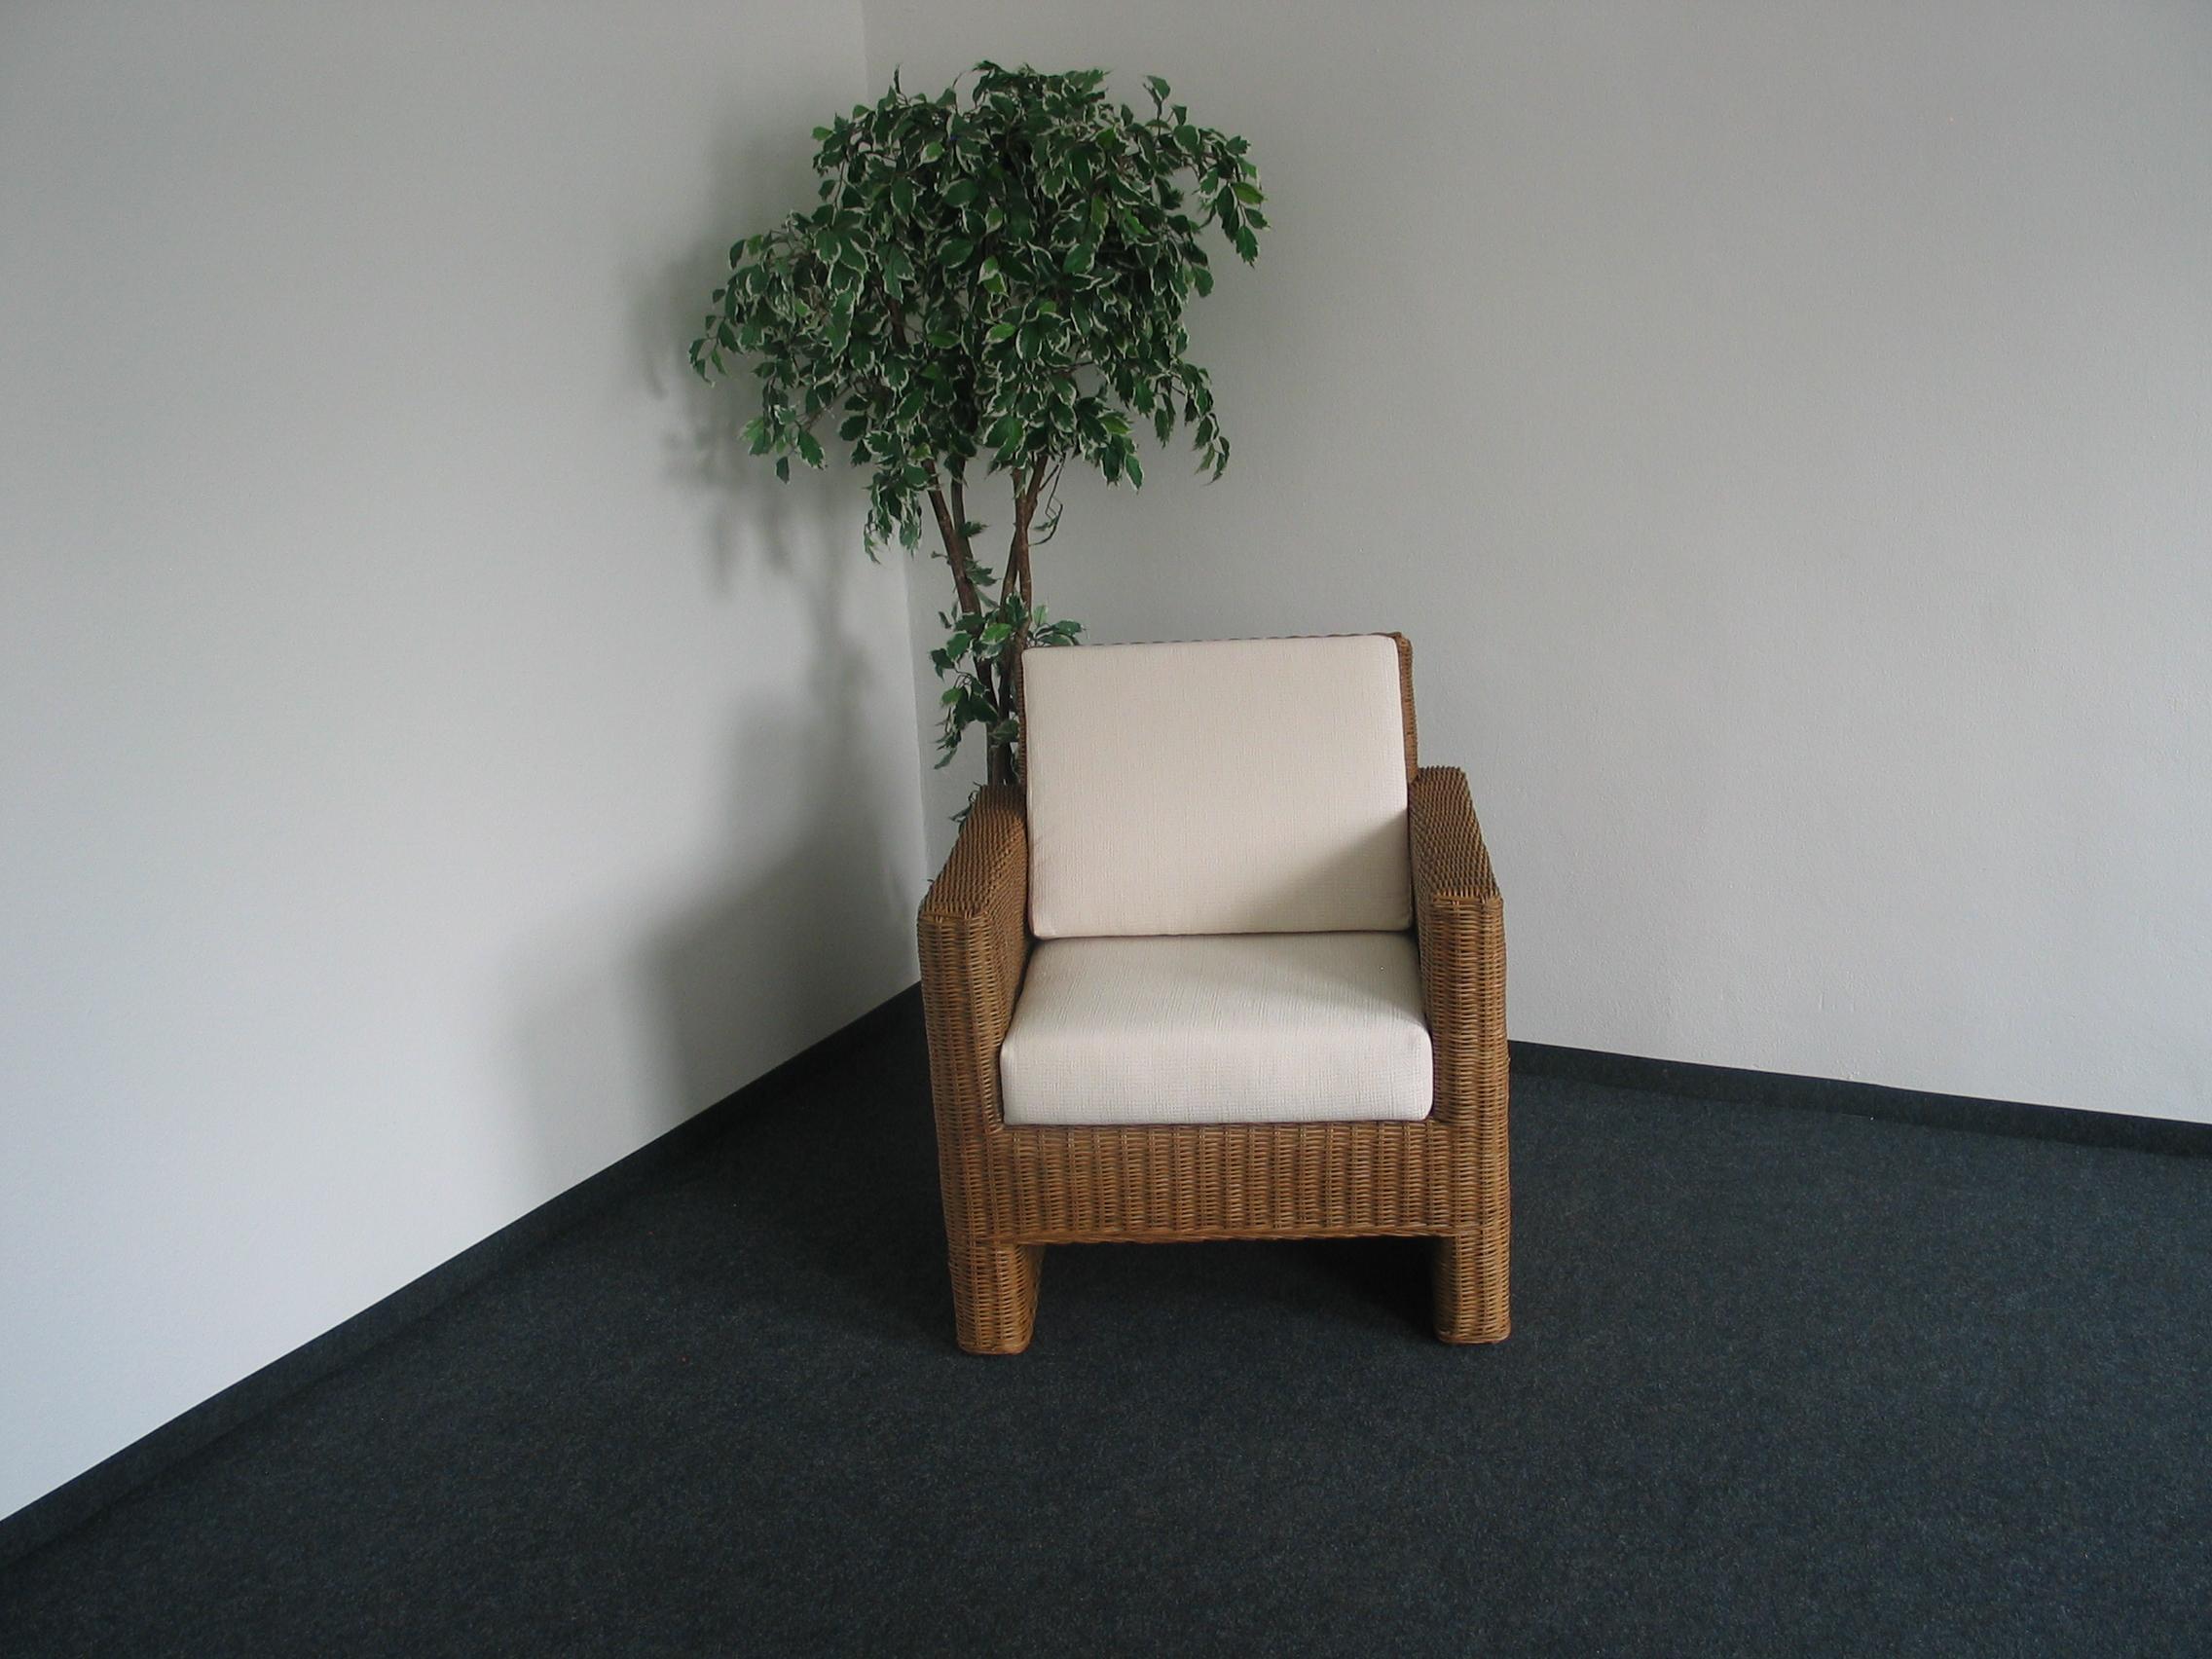 rattansessel 05528 1 wohnen rattanm bel fitalia shop. Black Bedroom Furniture Sets. Home Design Ideas